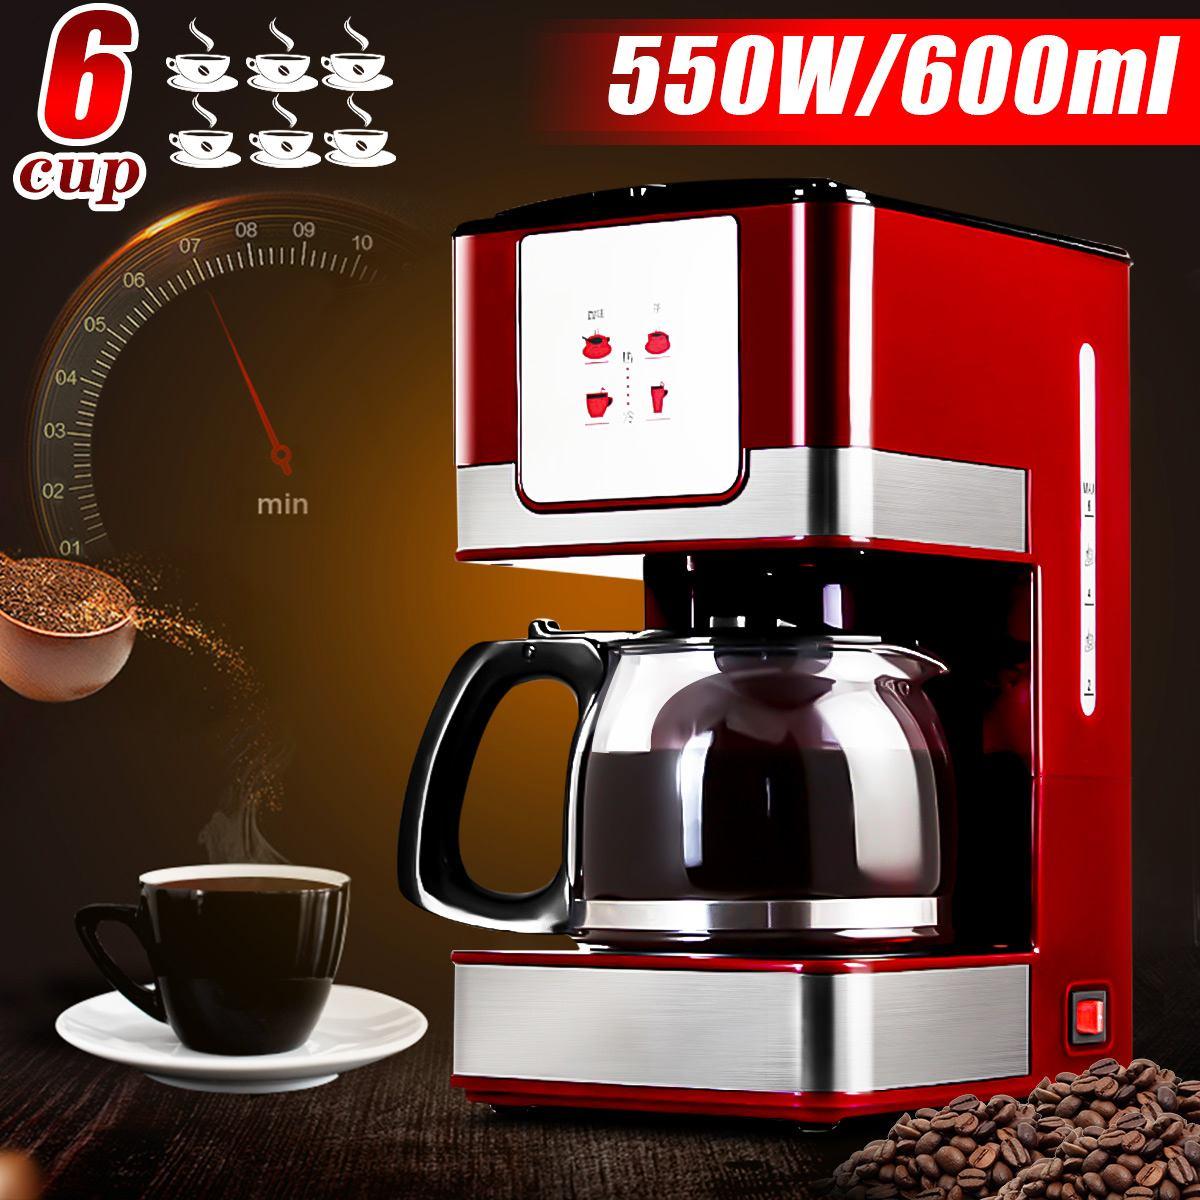 Becornce 6 Cups 600ML Coffee Tea Machines Household Office American Style Drip Tea/Coffee Making Machine Coffee Machine 550W